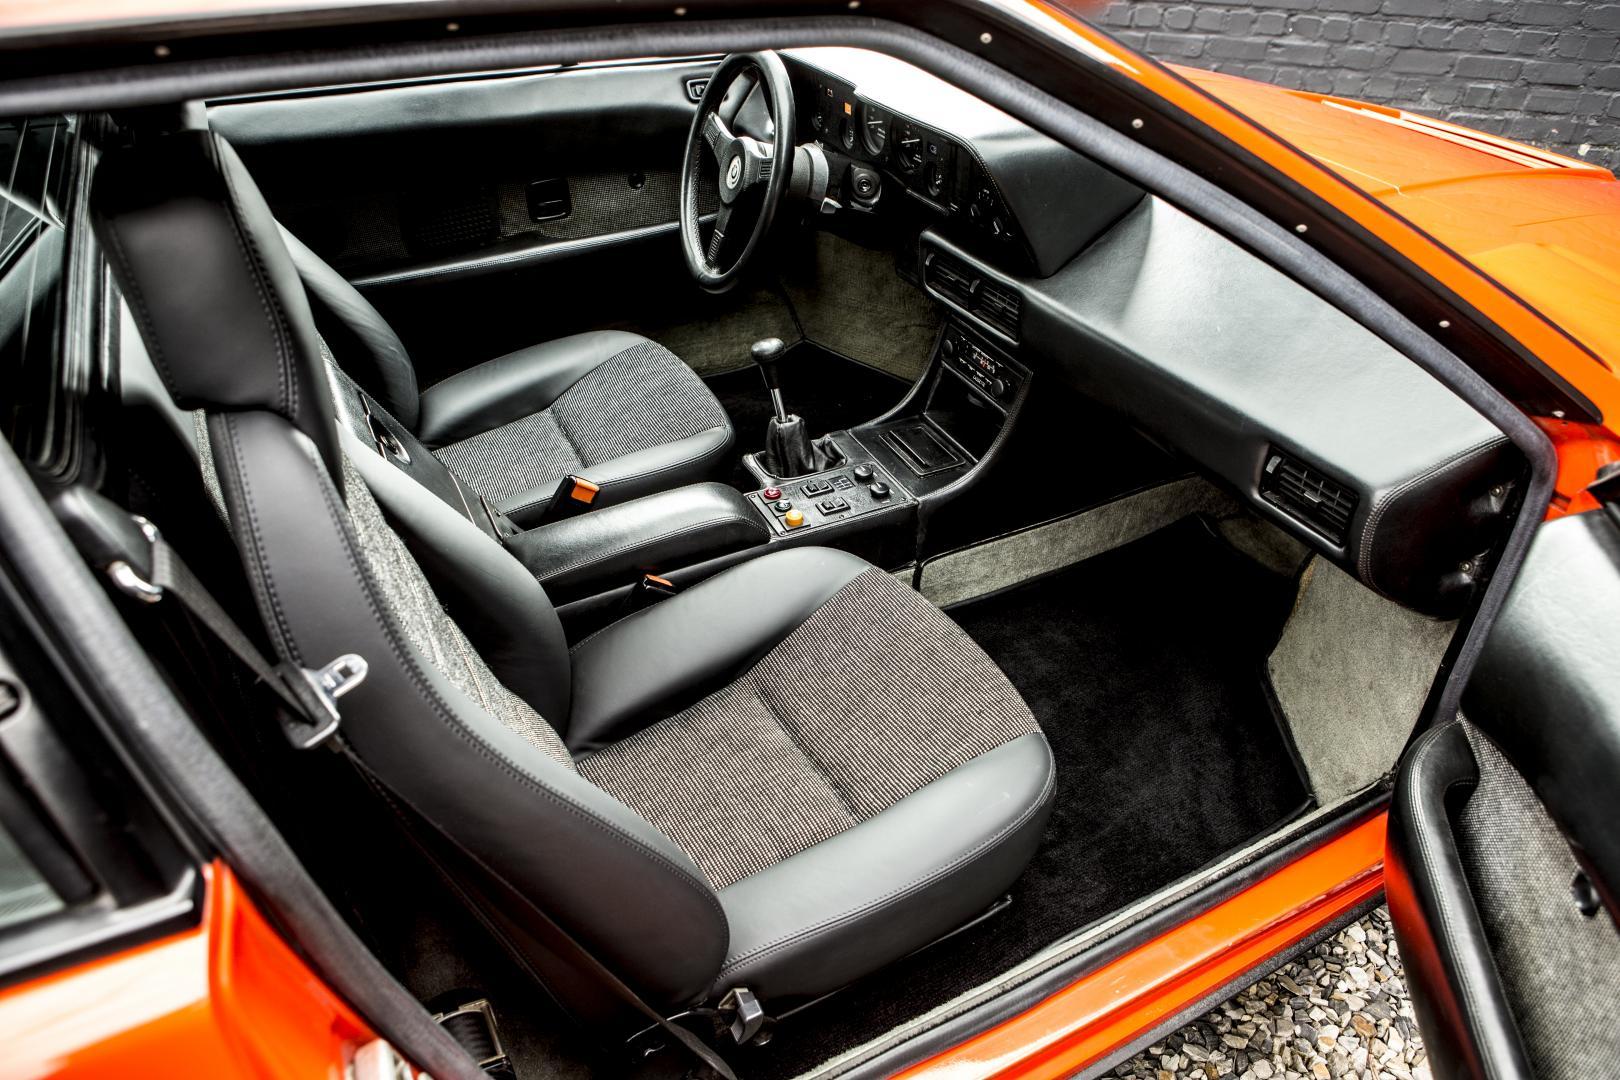 Veiling BMW M1 interieur (1980)